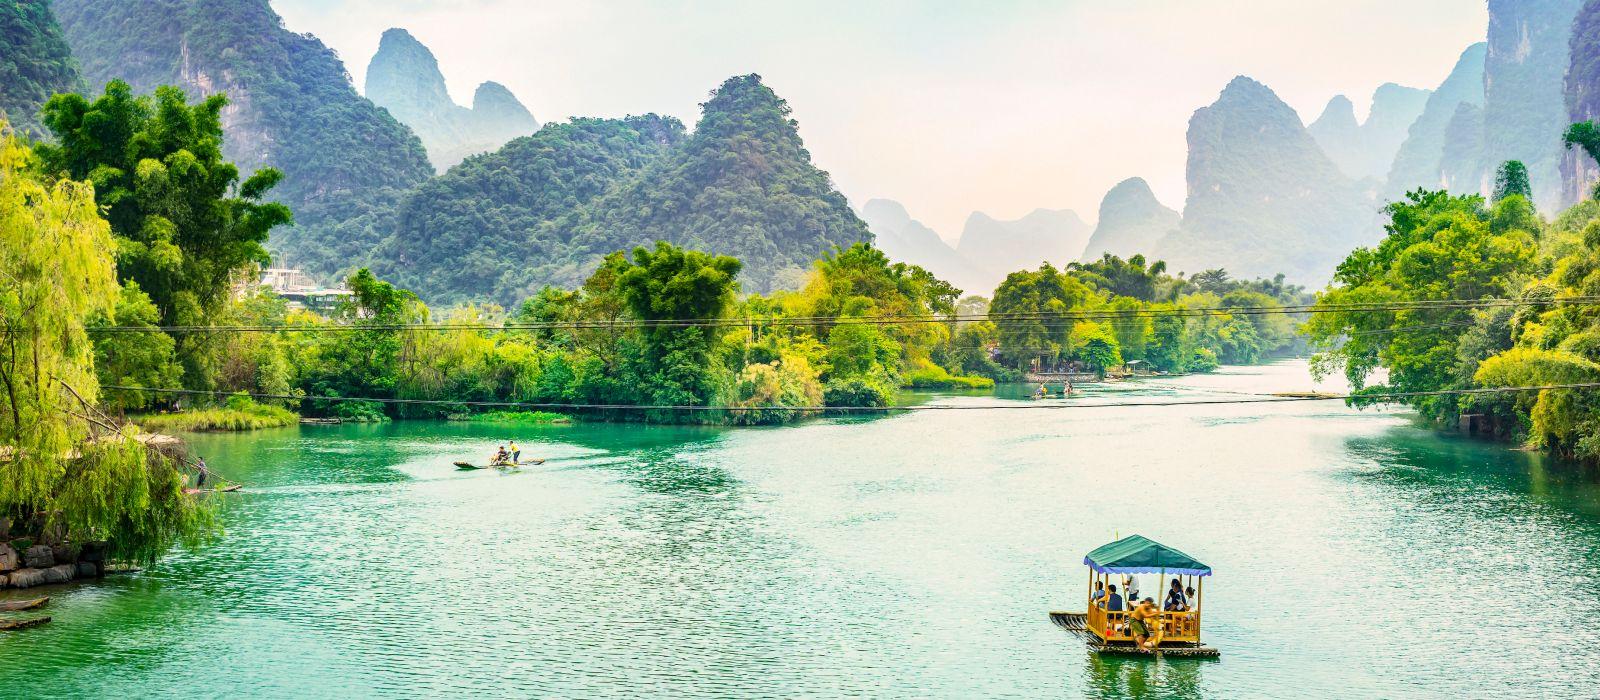 Reiseziel Guilin China